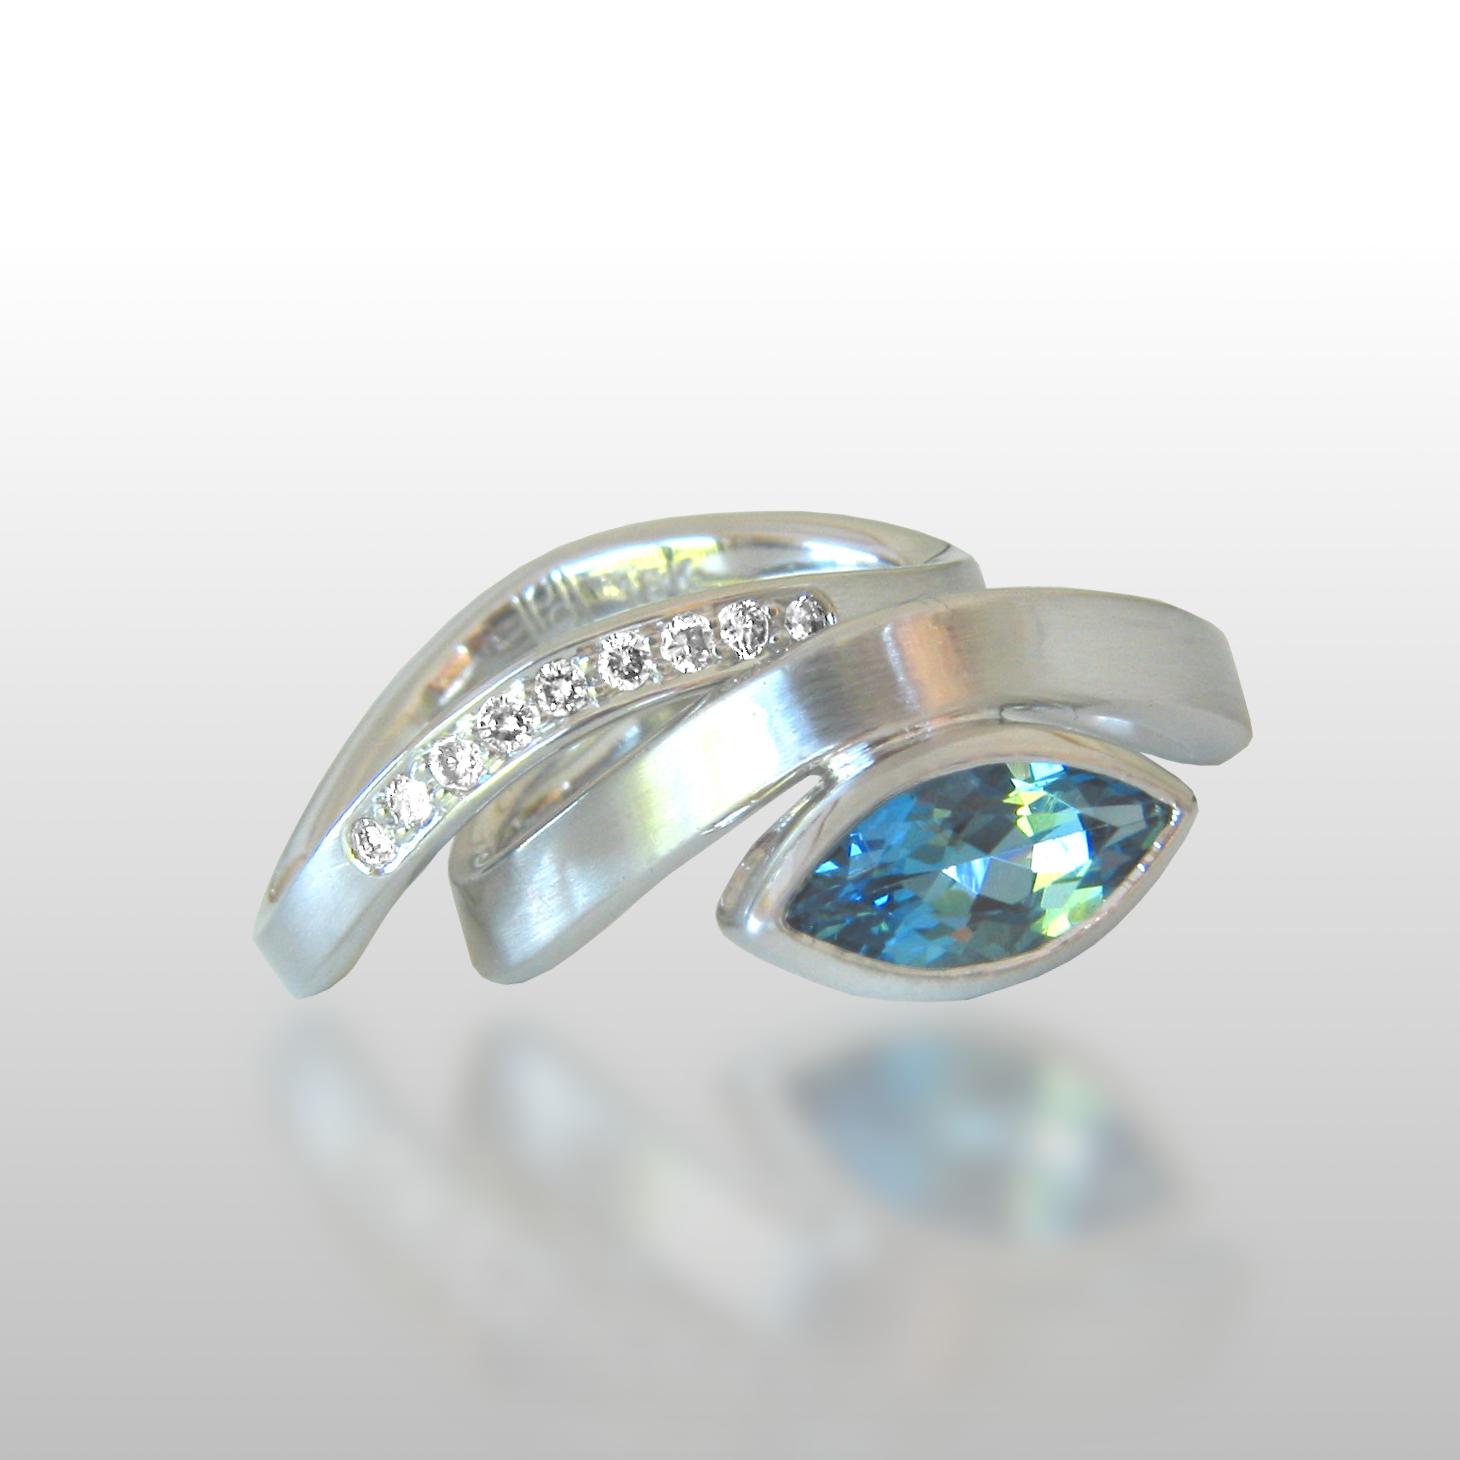 Contemporary 18k white gold wedding band set 'Synergy' with aquamarine and diamonds by Pratima Design Fine Art Jewelry